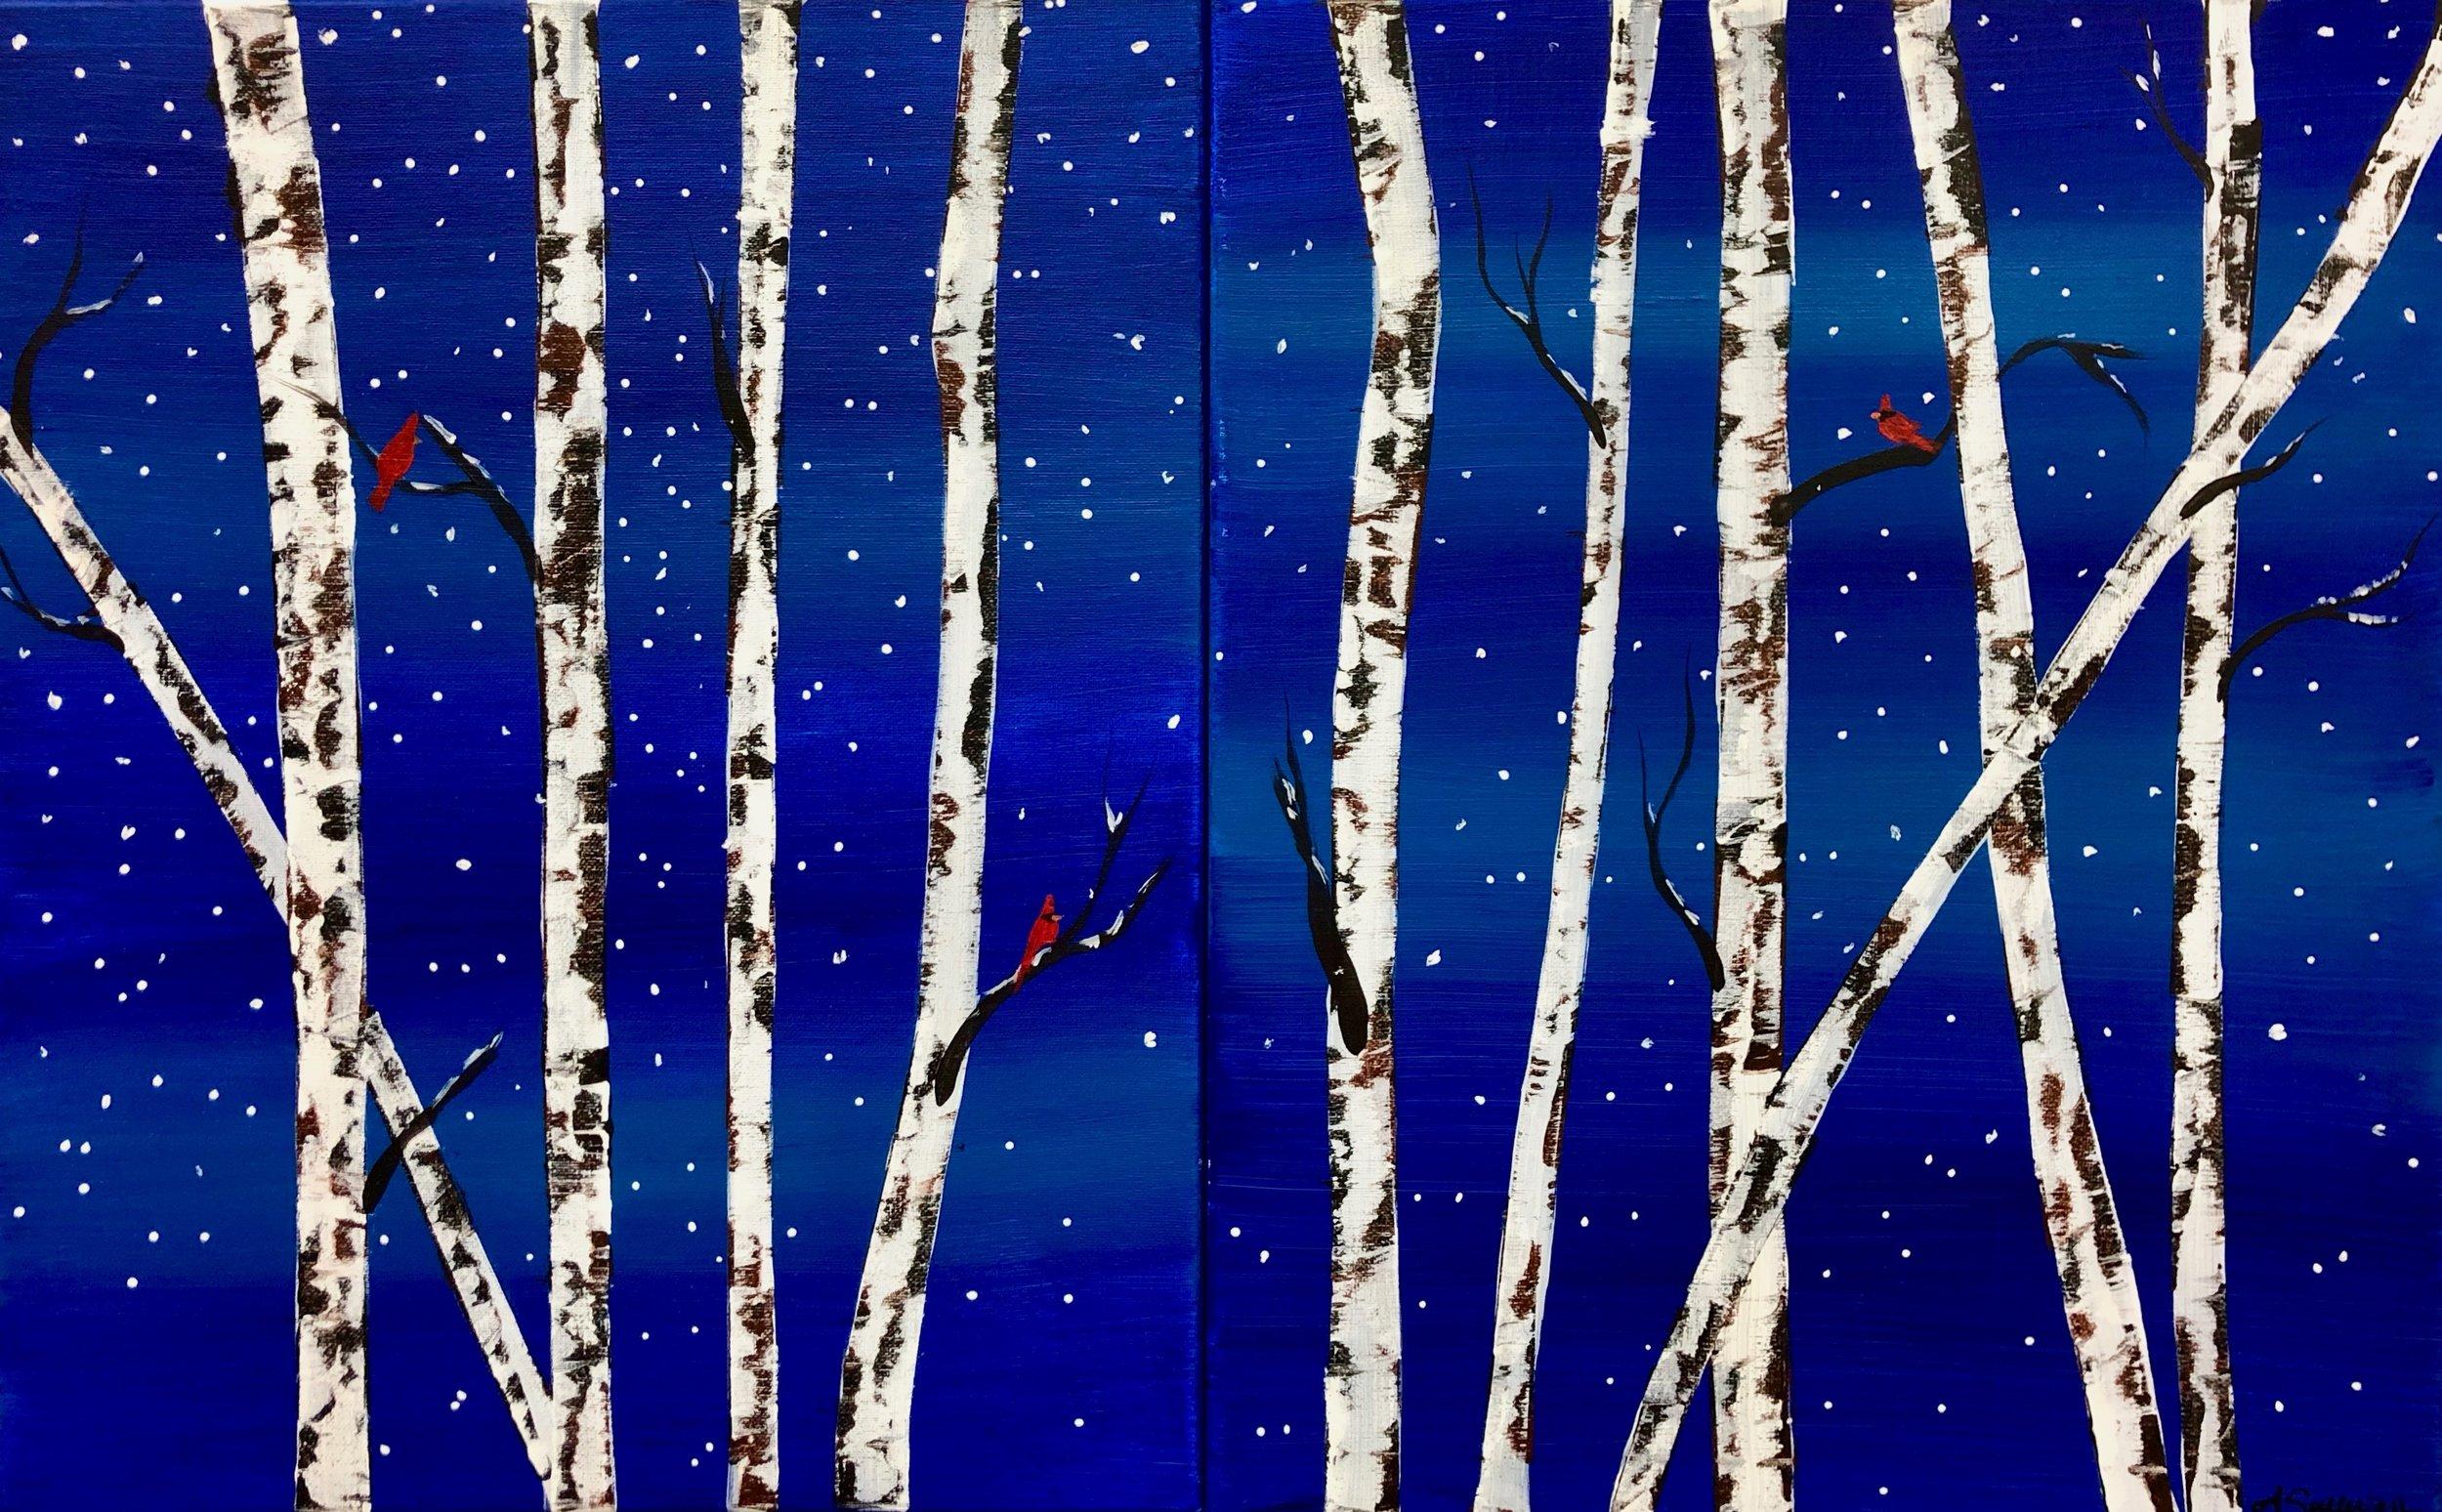 Winter's Birch